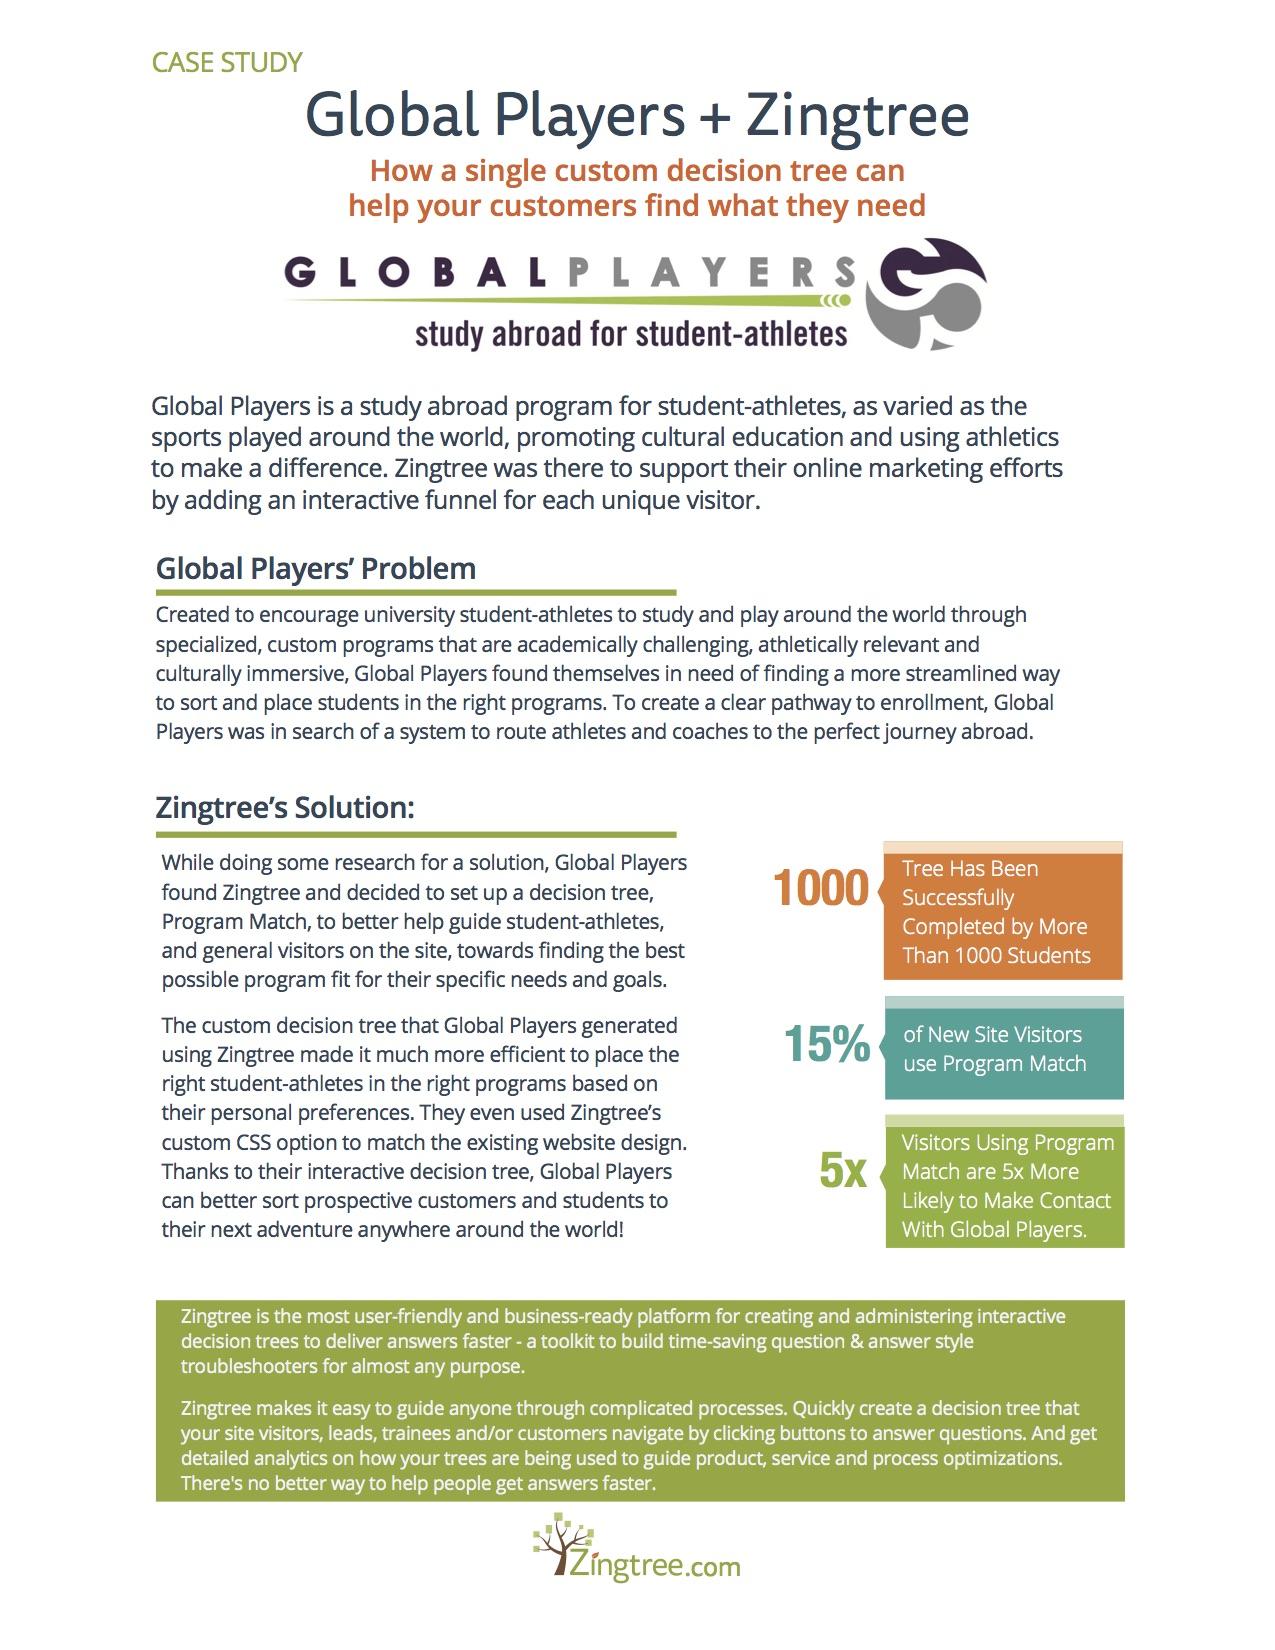 Marketing Case Study: Global Players